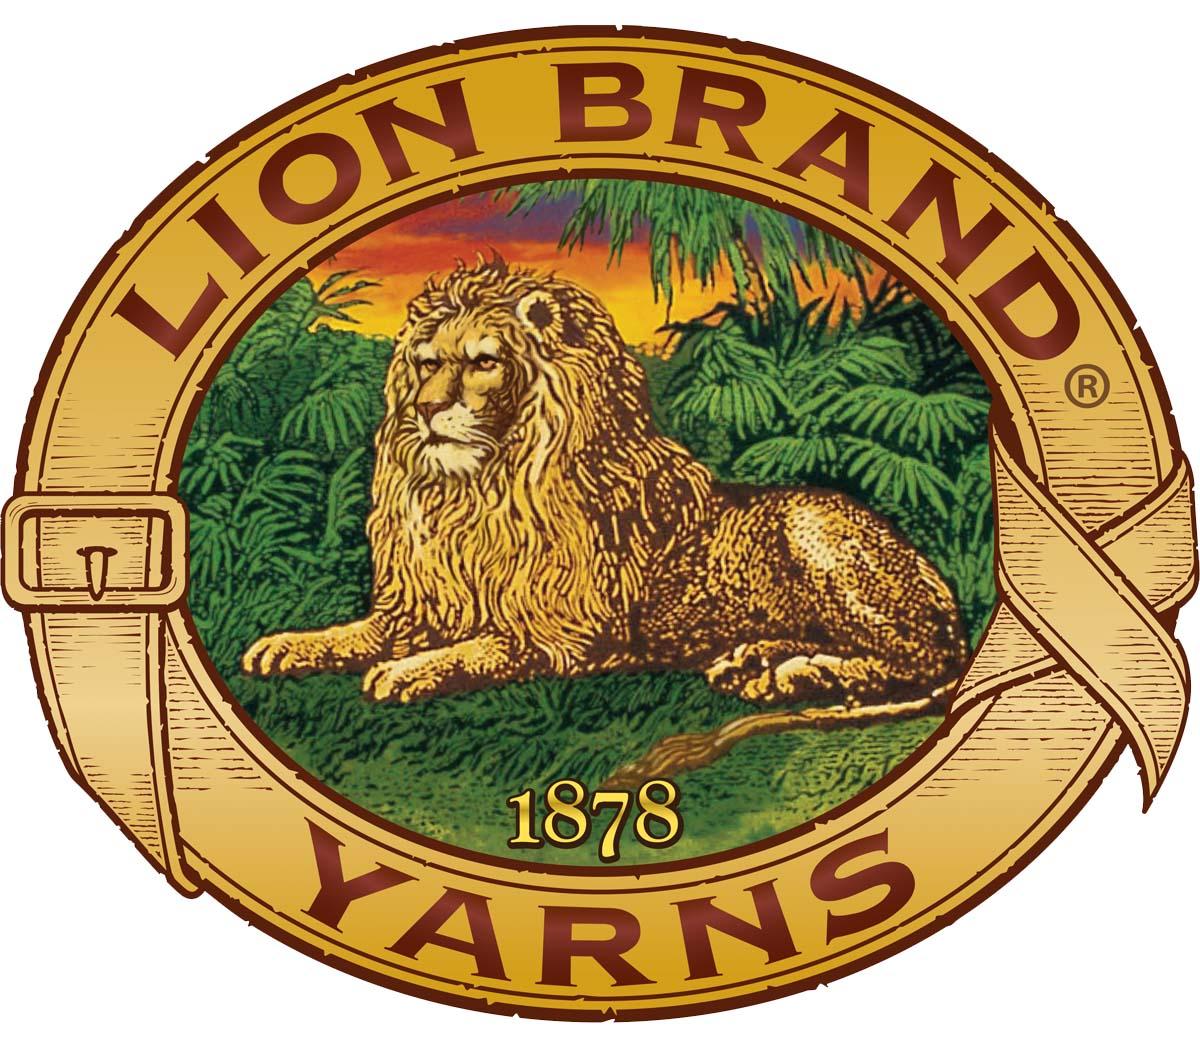 Lion Brand : Lion Brand Yarn AllFreeCrochet.com